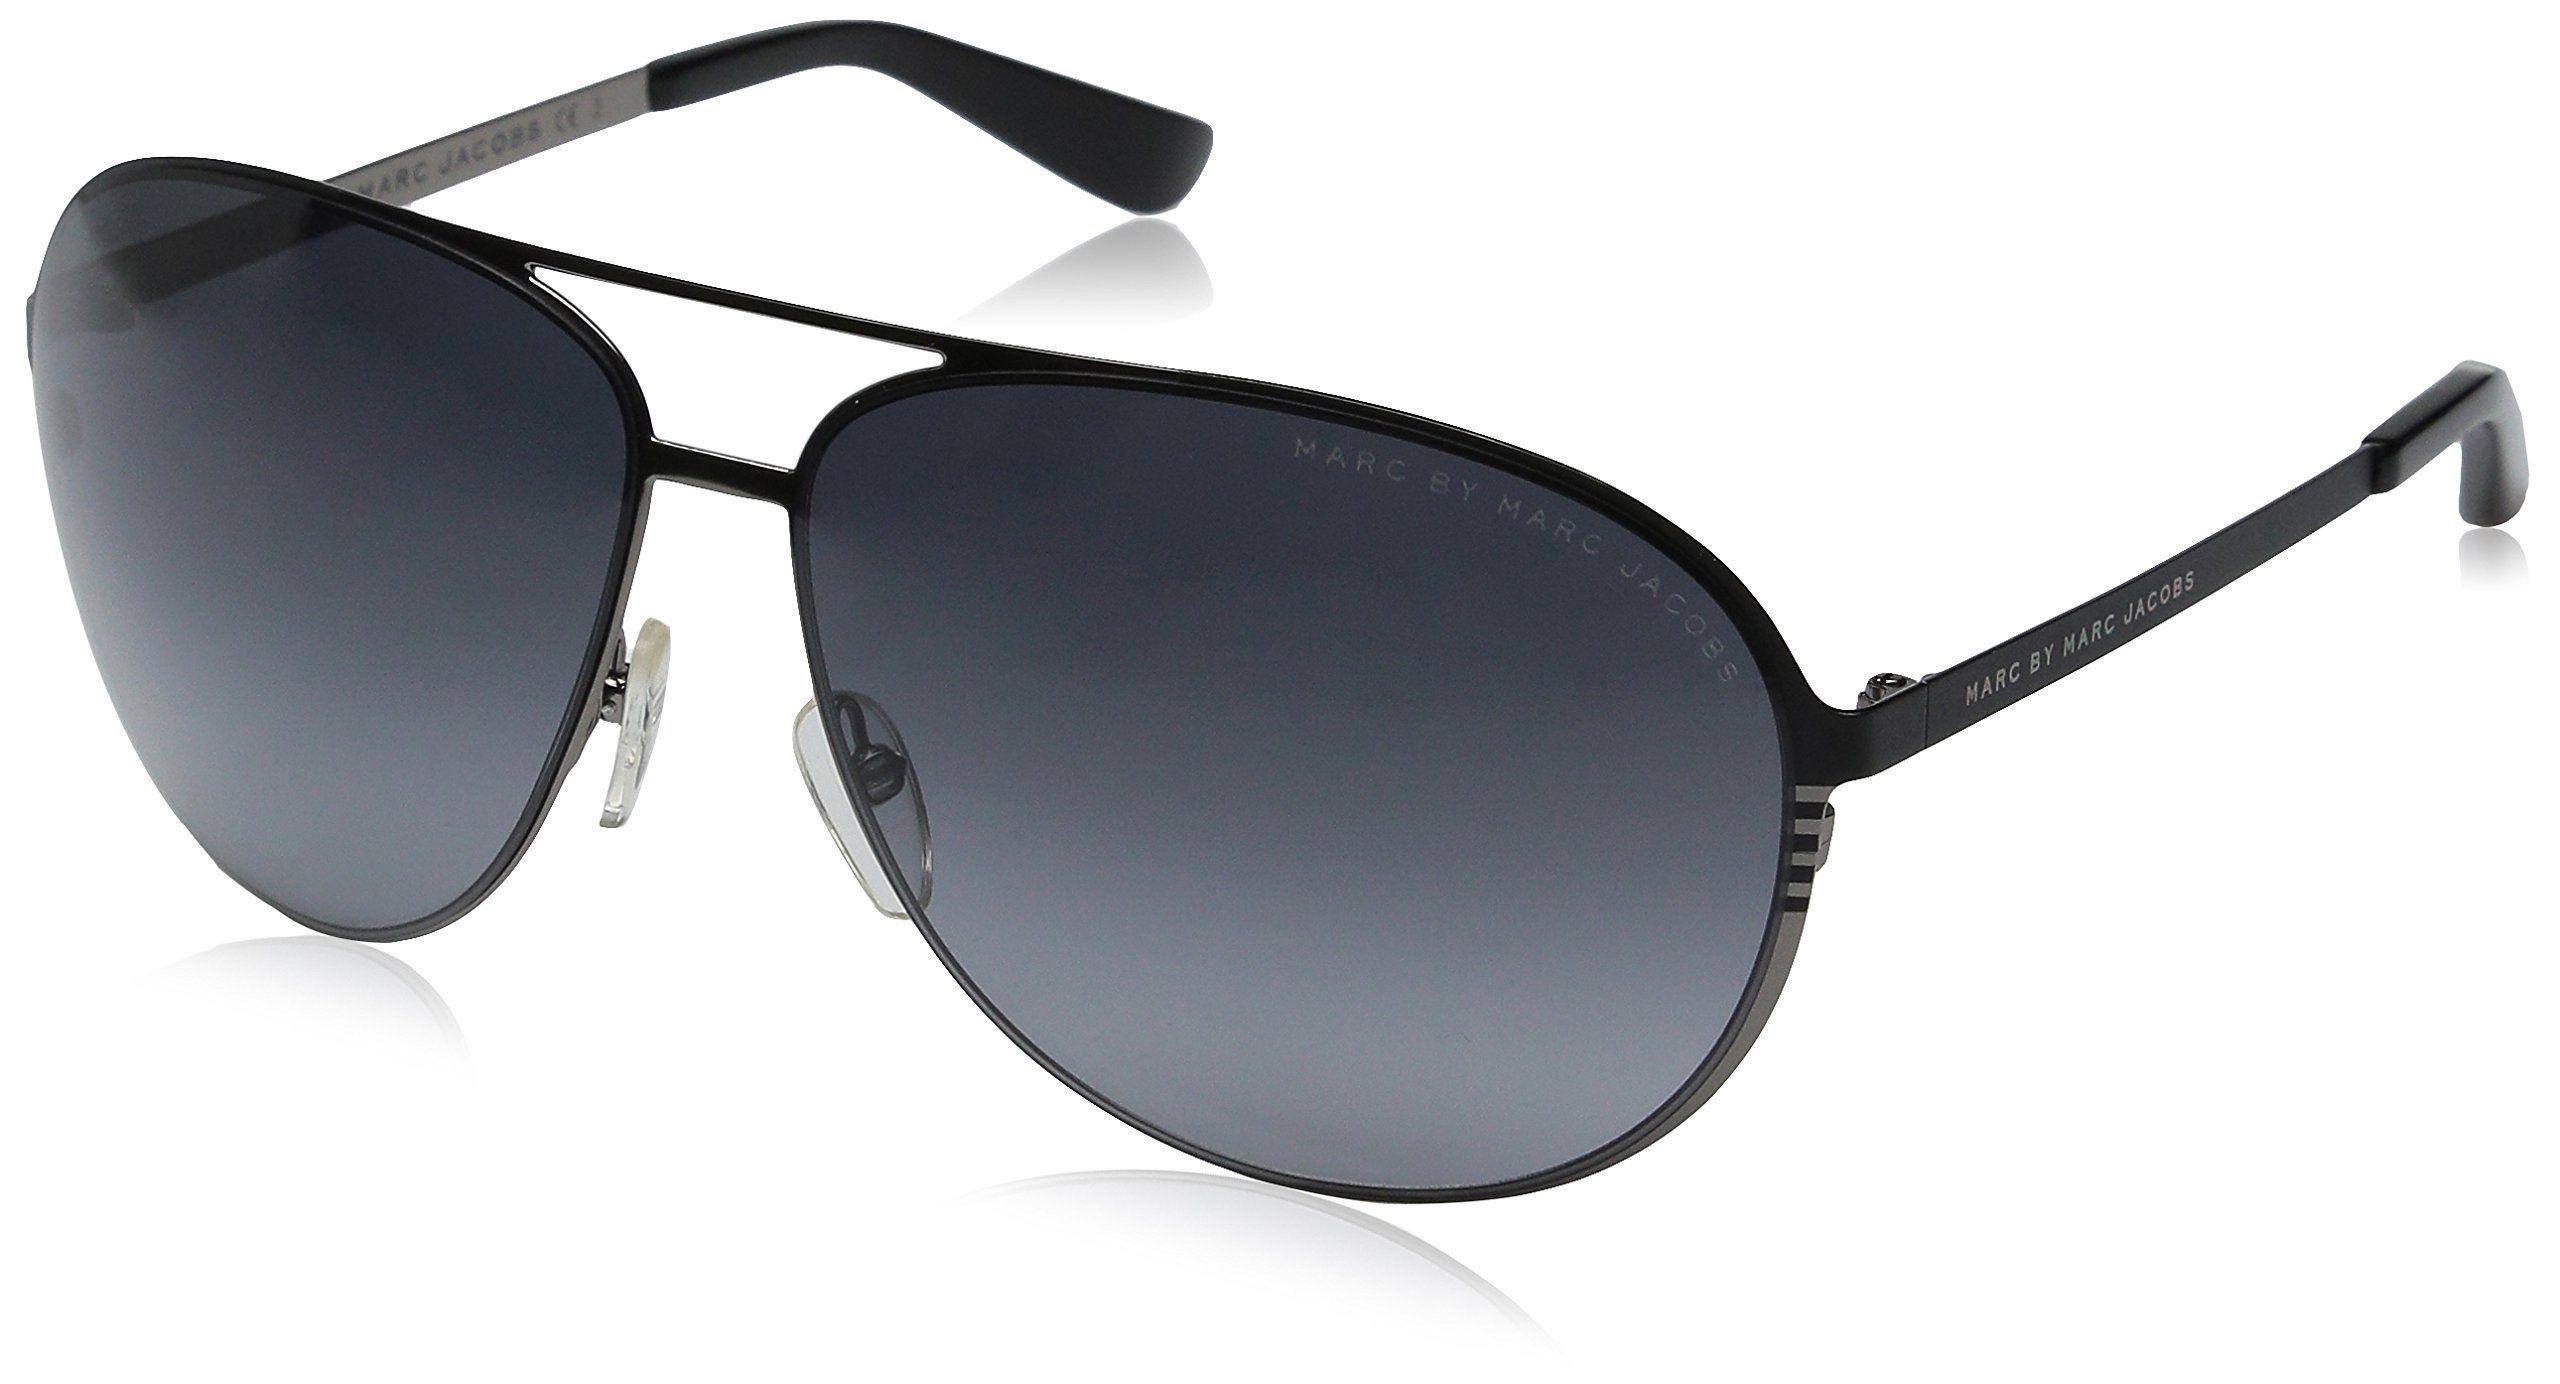 Marc by Marc Jacobs Women's MMJ393S Aviator Sunglasses, Dark Ruthenium, 62 mm. Case Included.